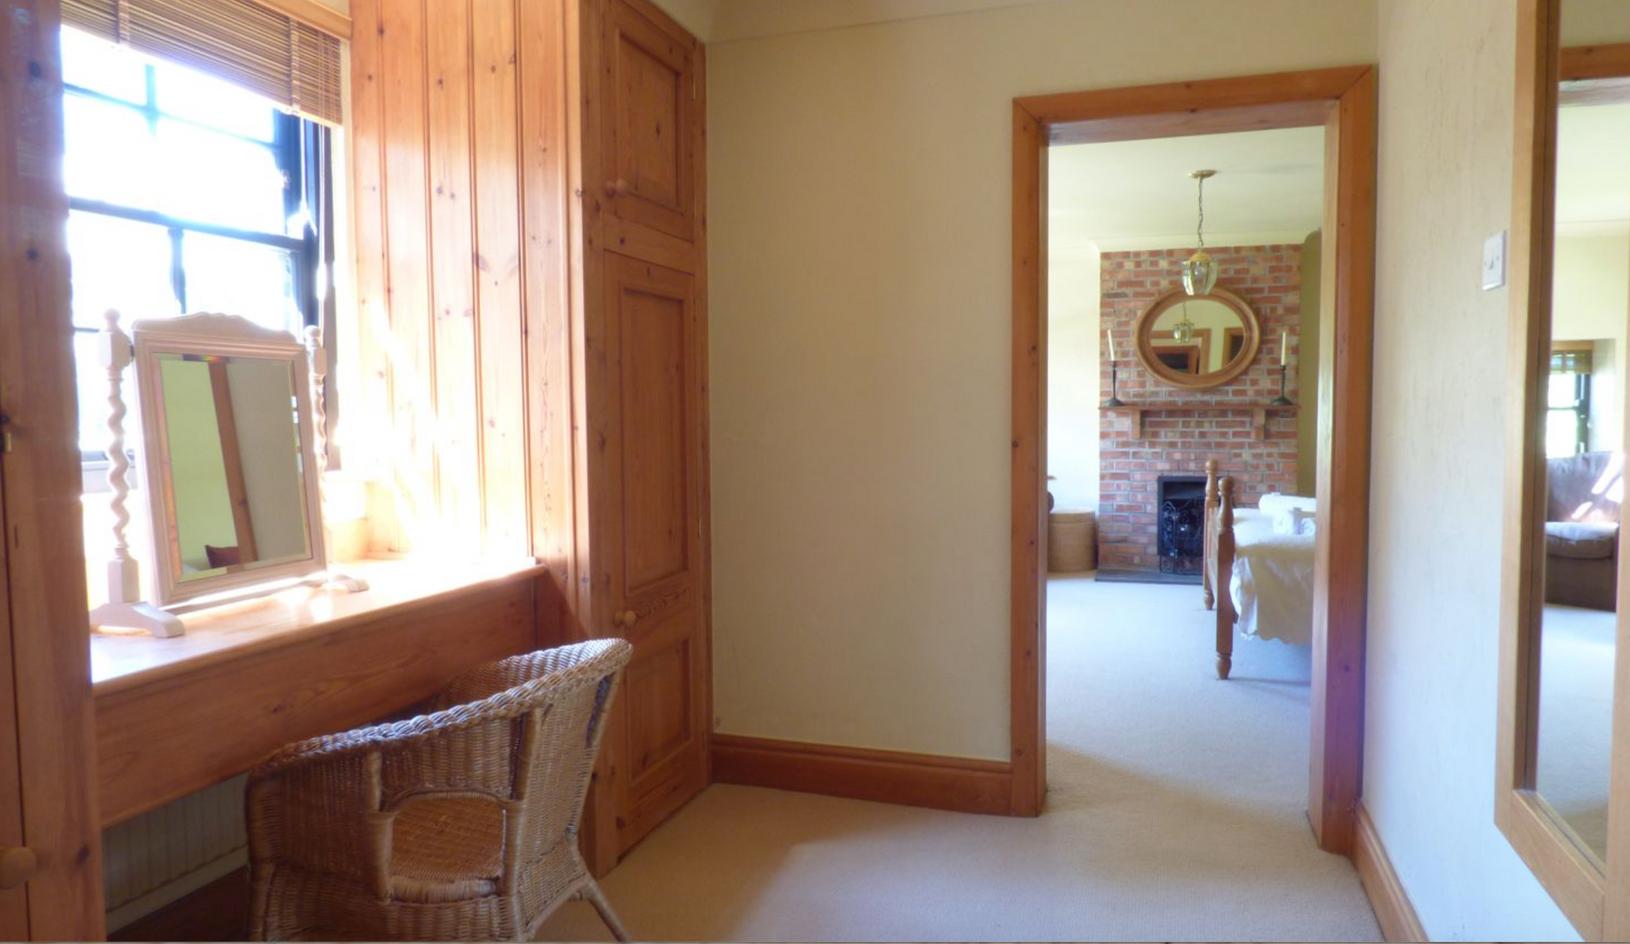 Coach House King Bedroom with En-Suite Bathroom